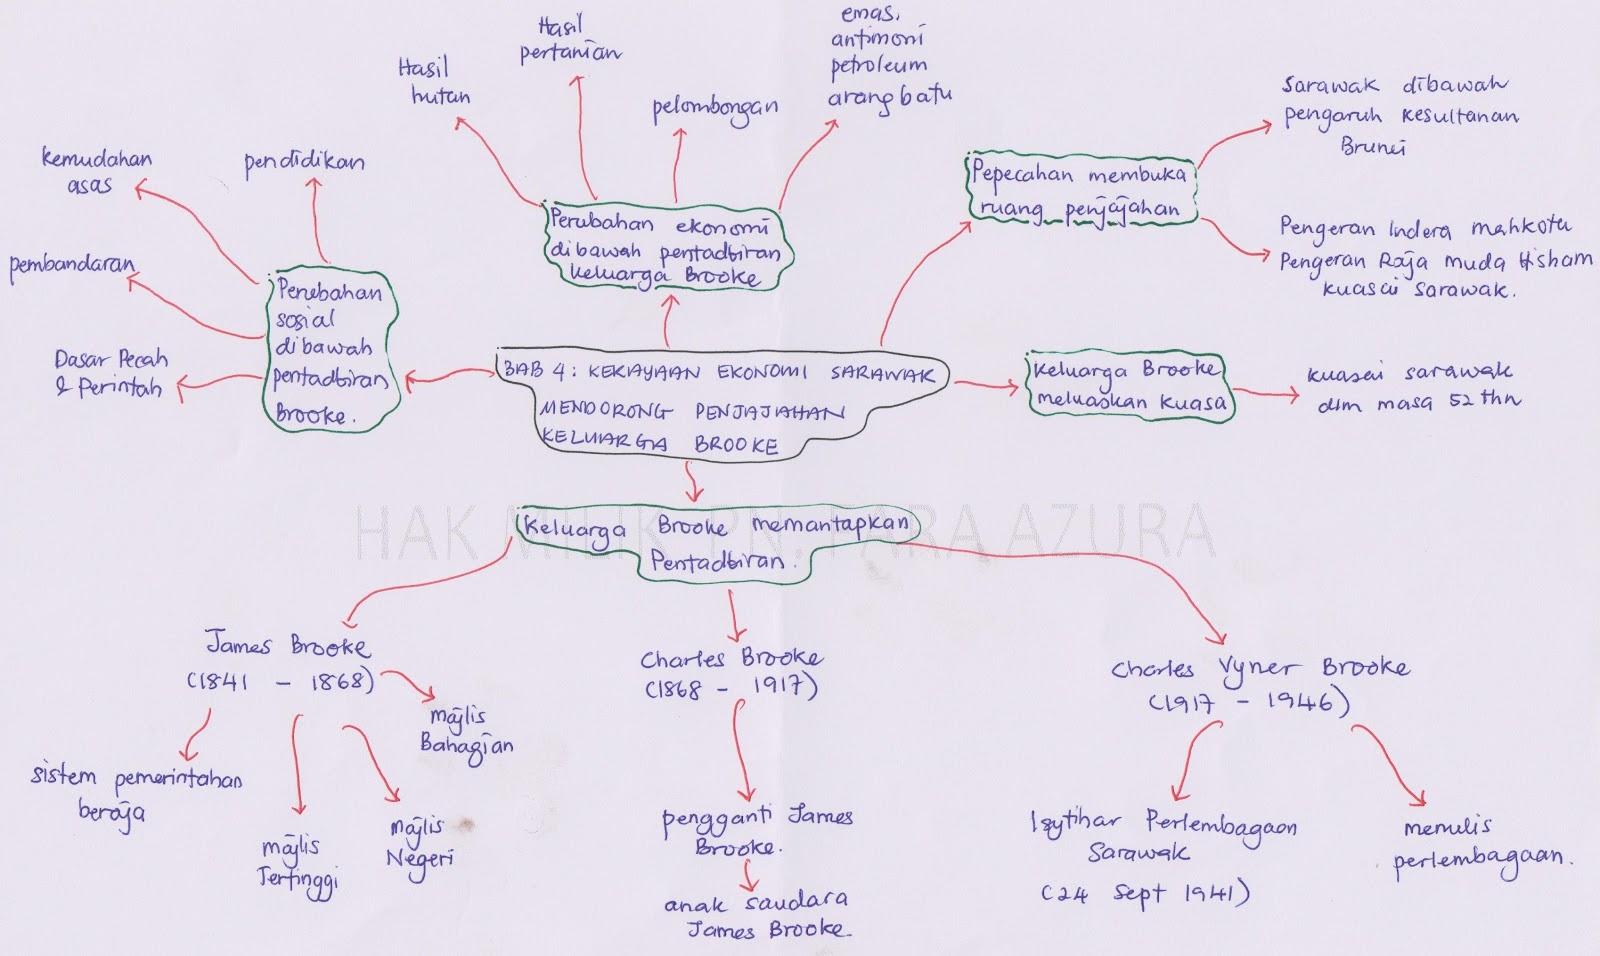 Contoh Jawapan Sejarah Kertas 3 Tingkatan 5 Bab 5 Contoh Soal2